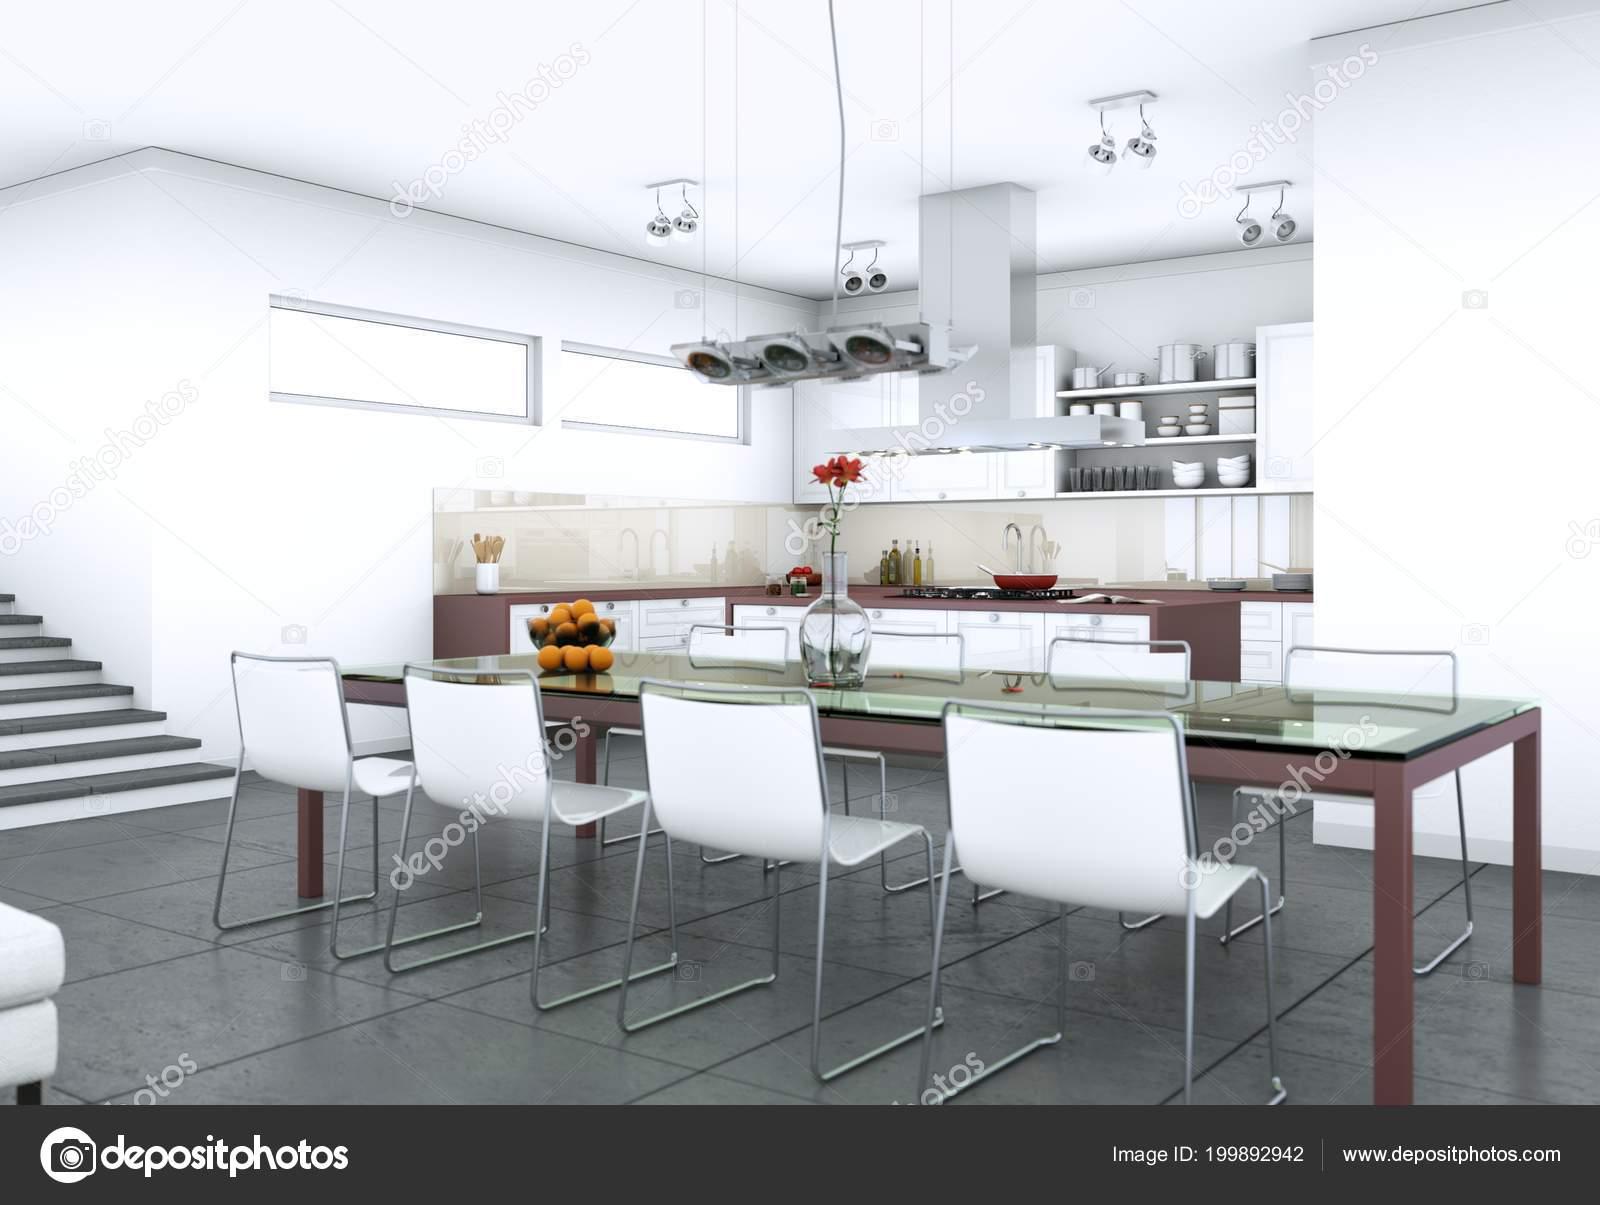 Elegant arredamento sala da pranzo in moderno foto stock with arredamento sala da pranzo moderna - Arredo sala da pranzo moderna ...